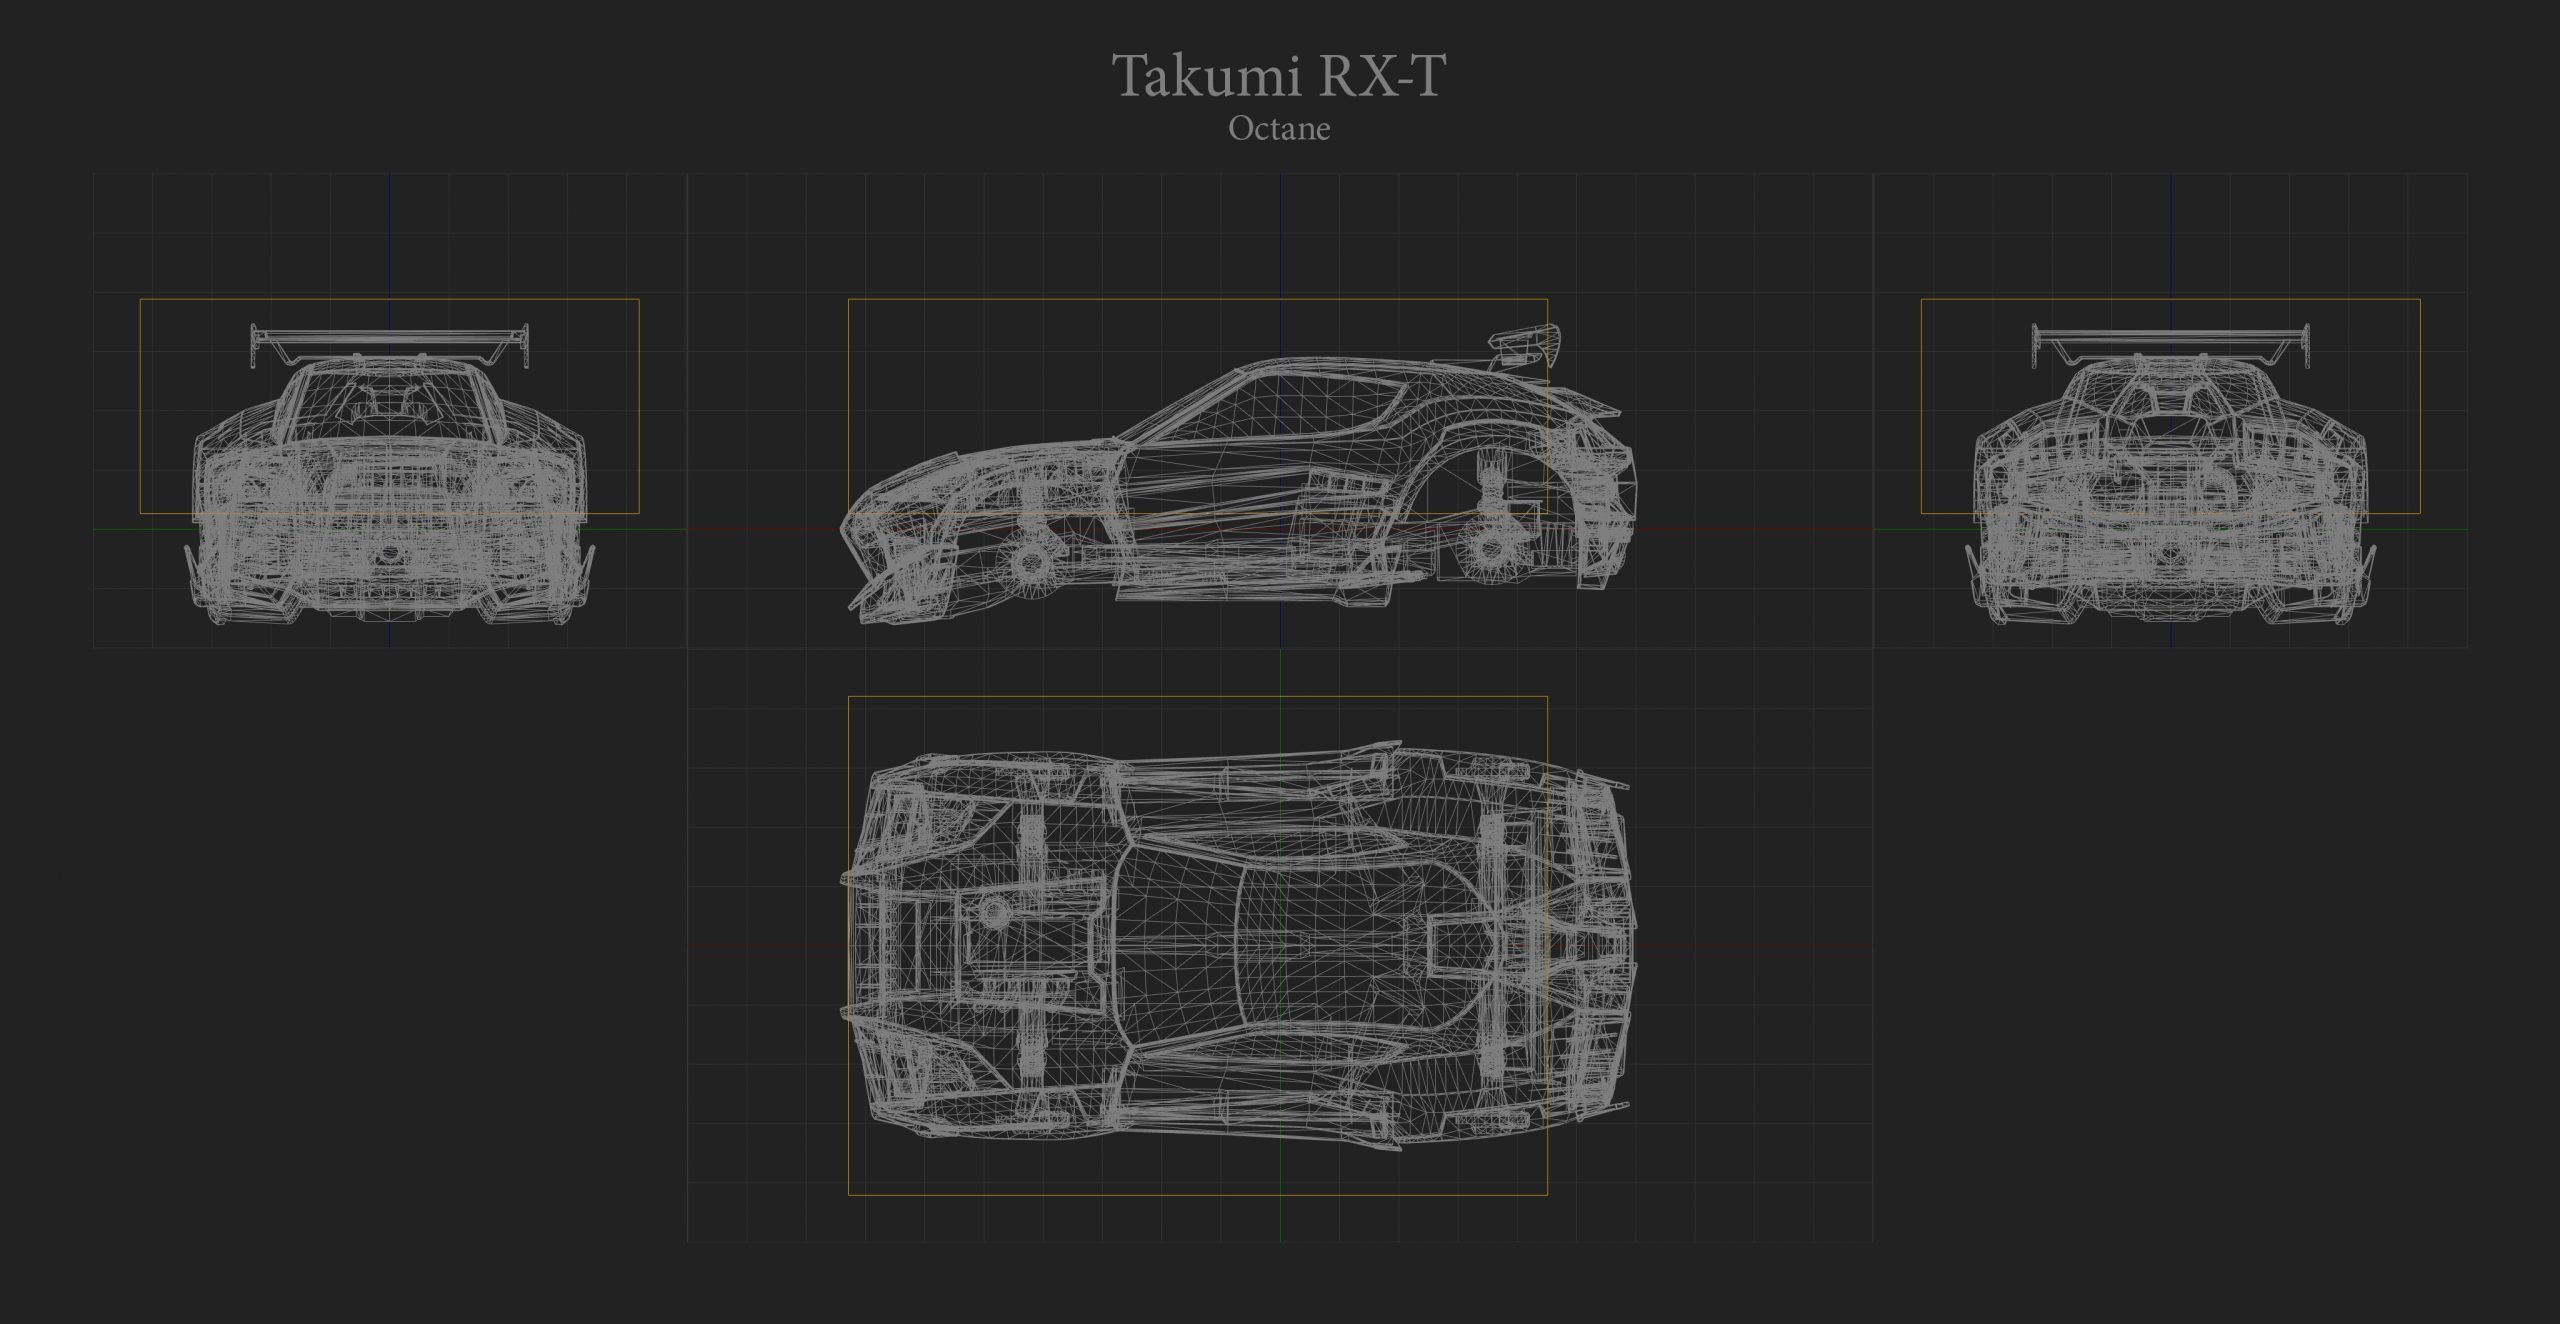 Takumi RXT Hitbox Rocket League